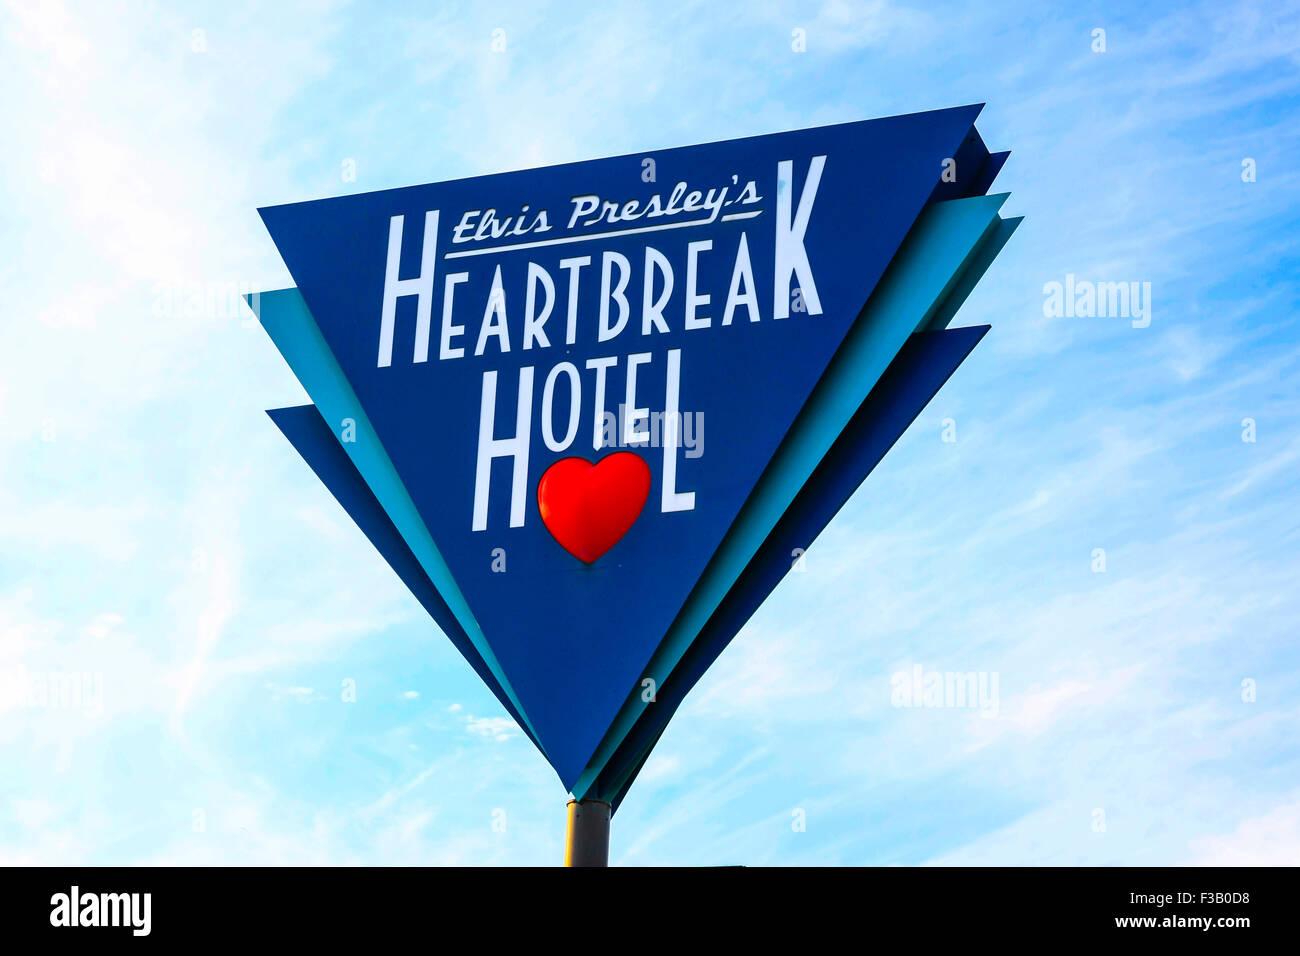 Triangular overhead sign of Elvis Presley's Heartbreak Hotel in Memphis Tennessee - Stock Image